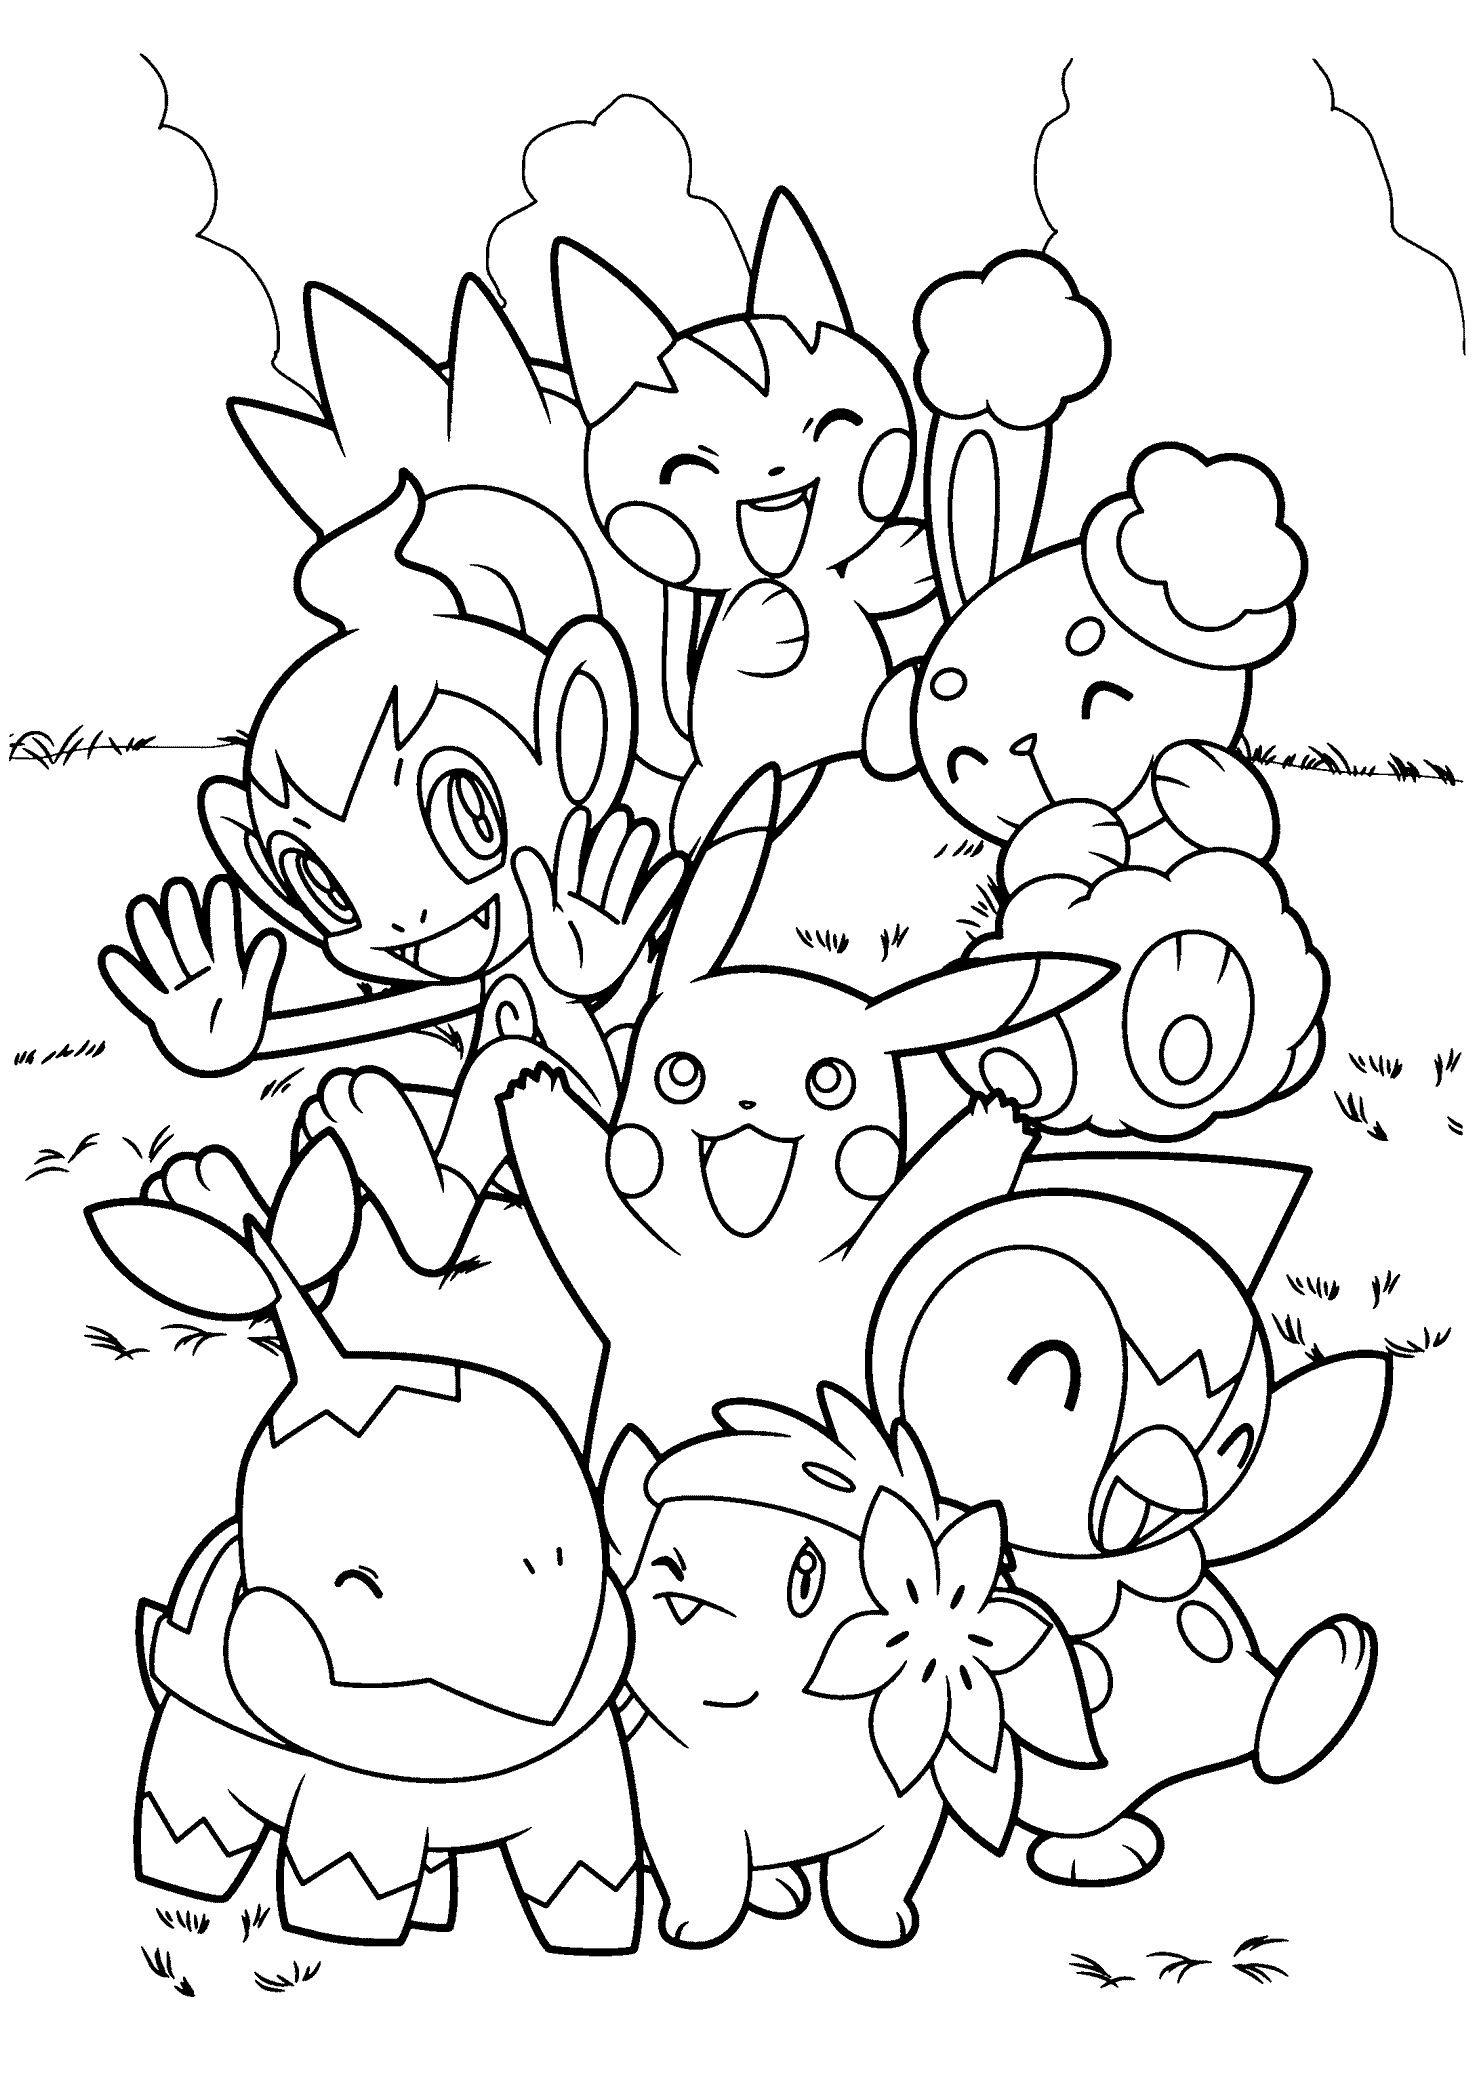 Pokemon Holiday Coloring Pages Med Bilder Farglaggningssidor